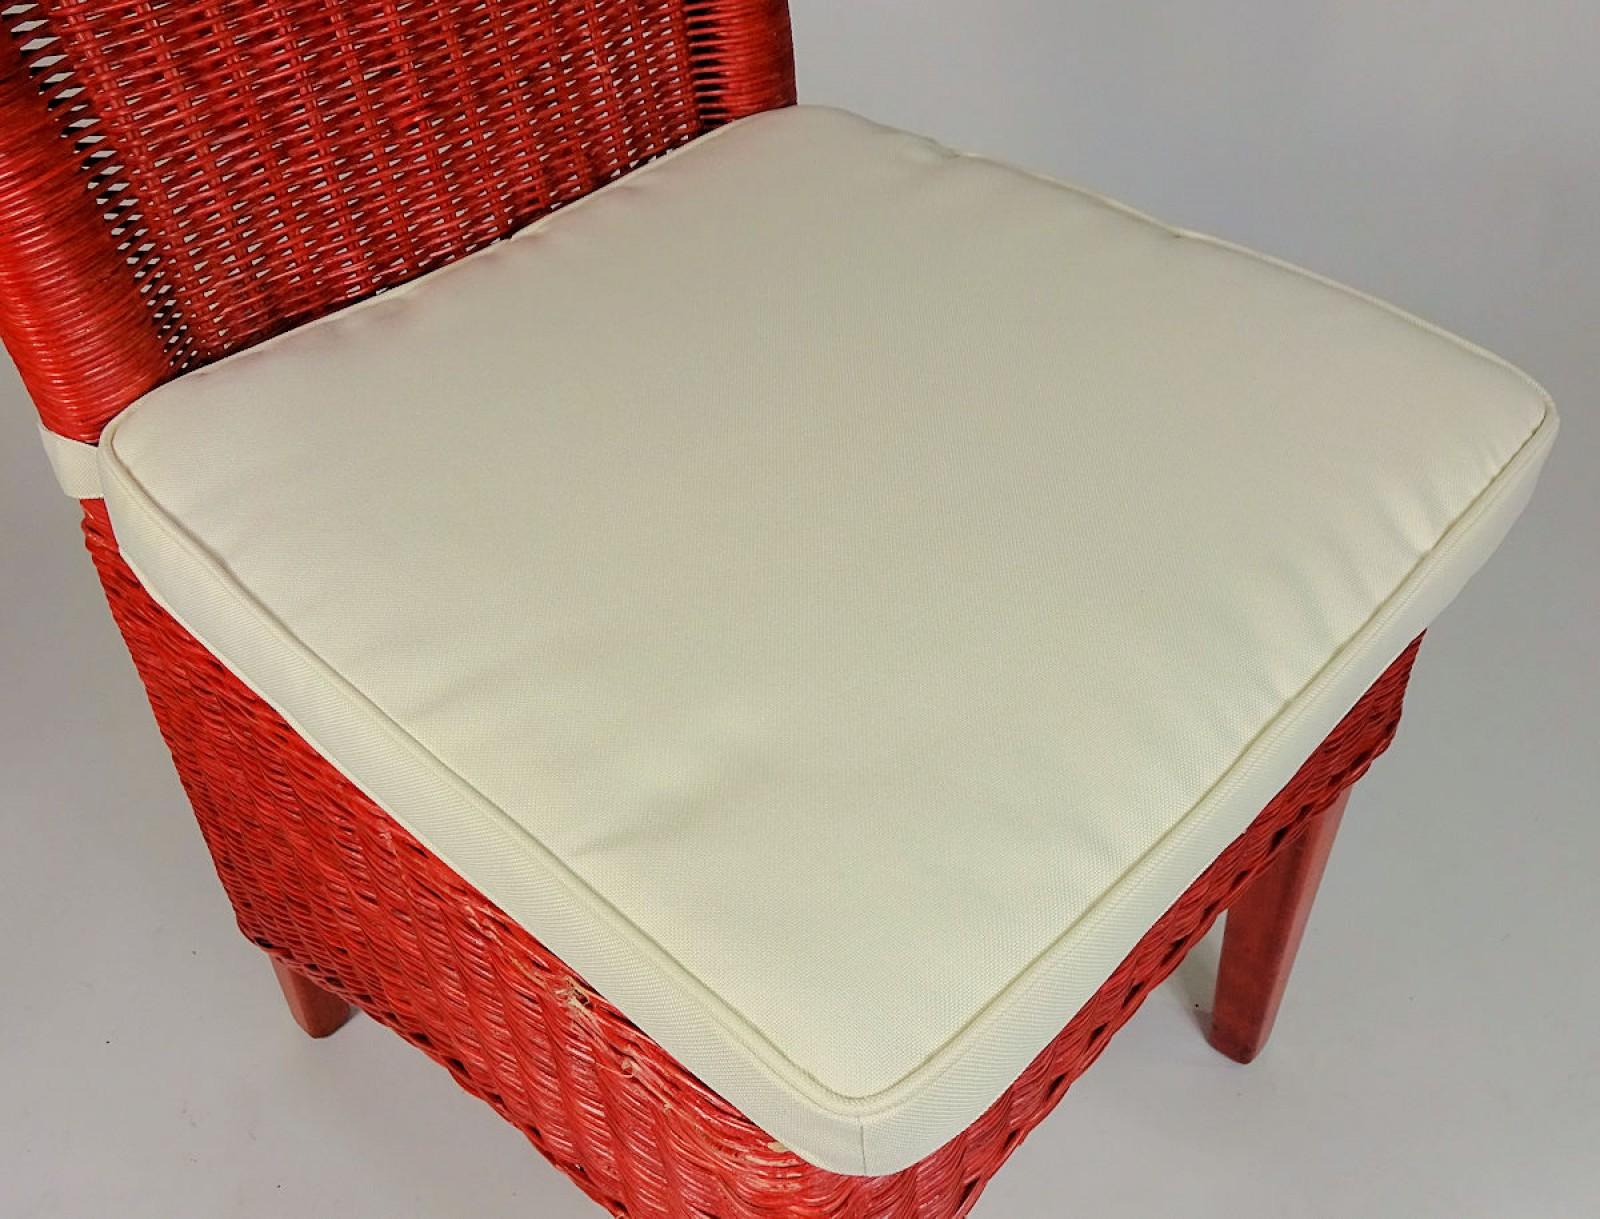 stuhlkissen sitzkissen bonia plus mit schleife 42 x 42 cm fb natur. Black Bedroom Furniture Sets. Home Design Ideas